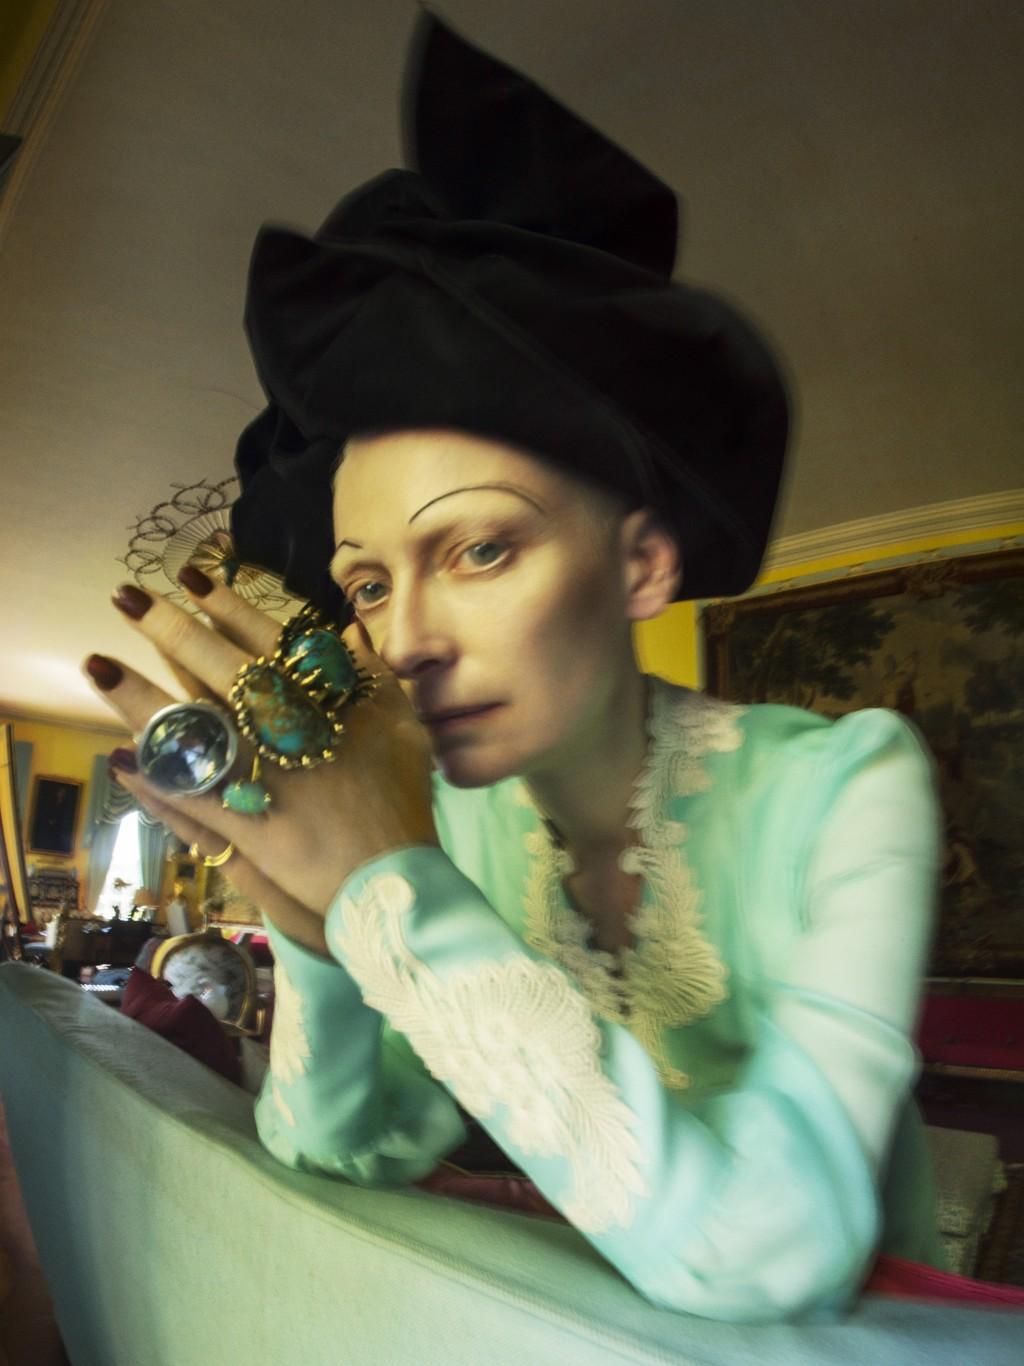 Tim Walker has invited many celebrities, such as Tilda Swinton, to behis models. (Tim Walker Studio photo)